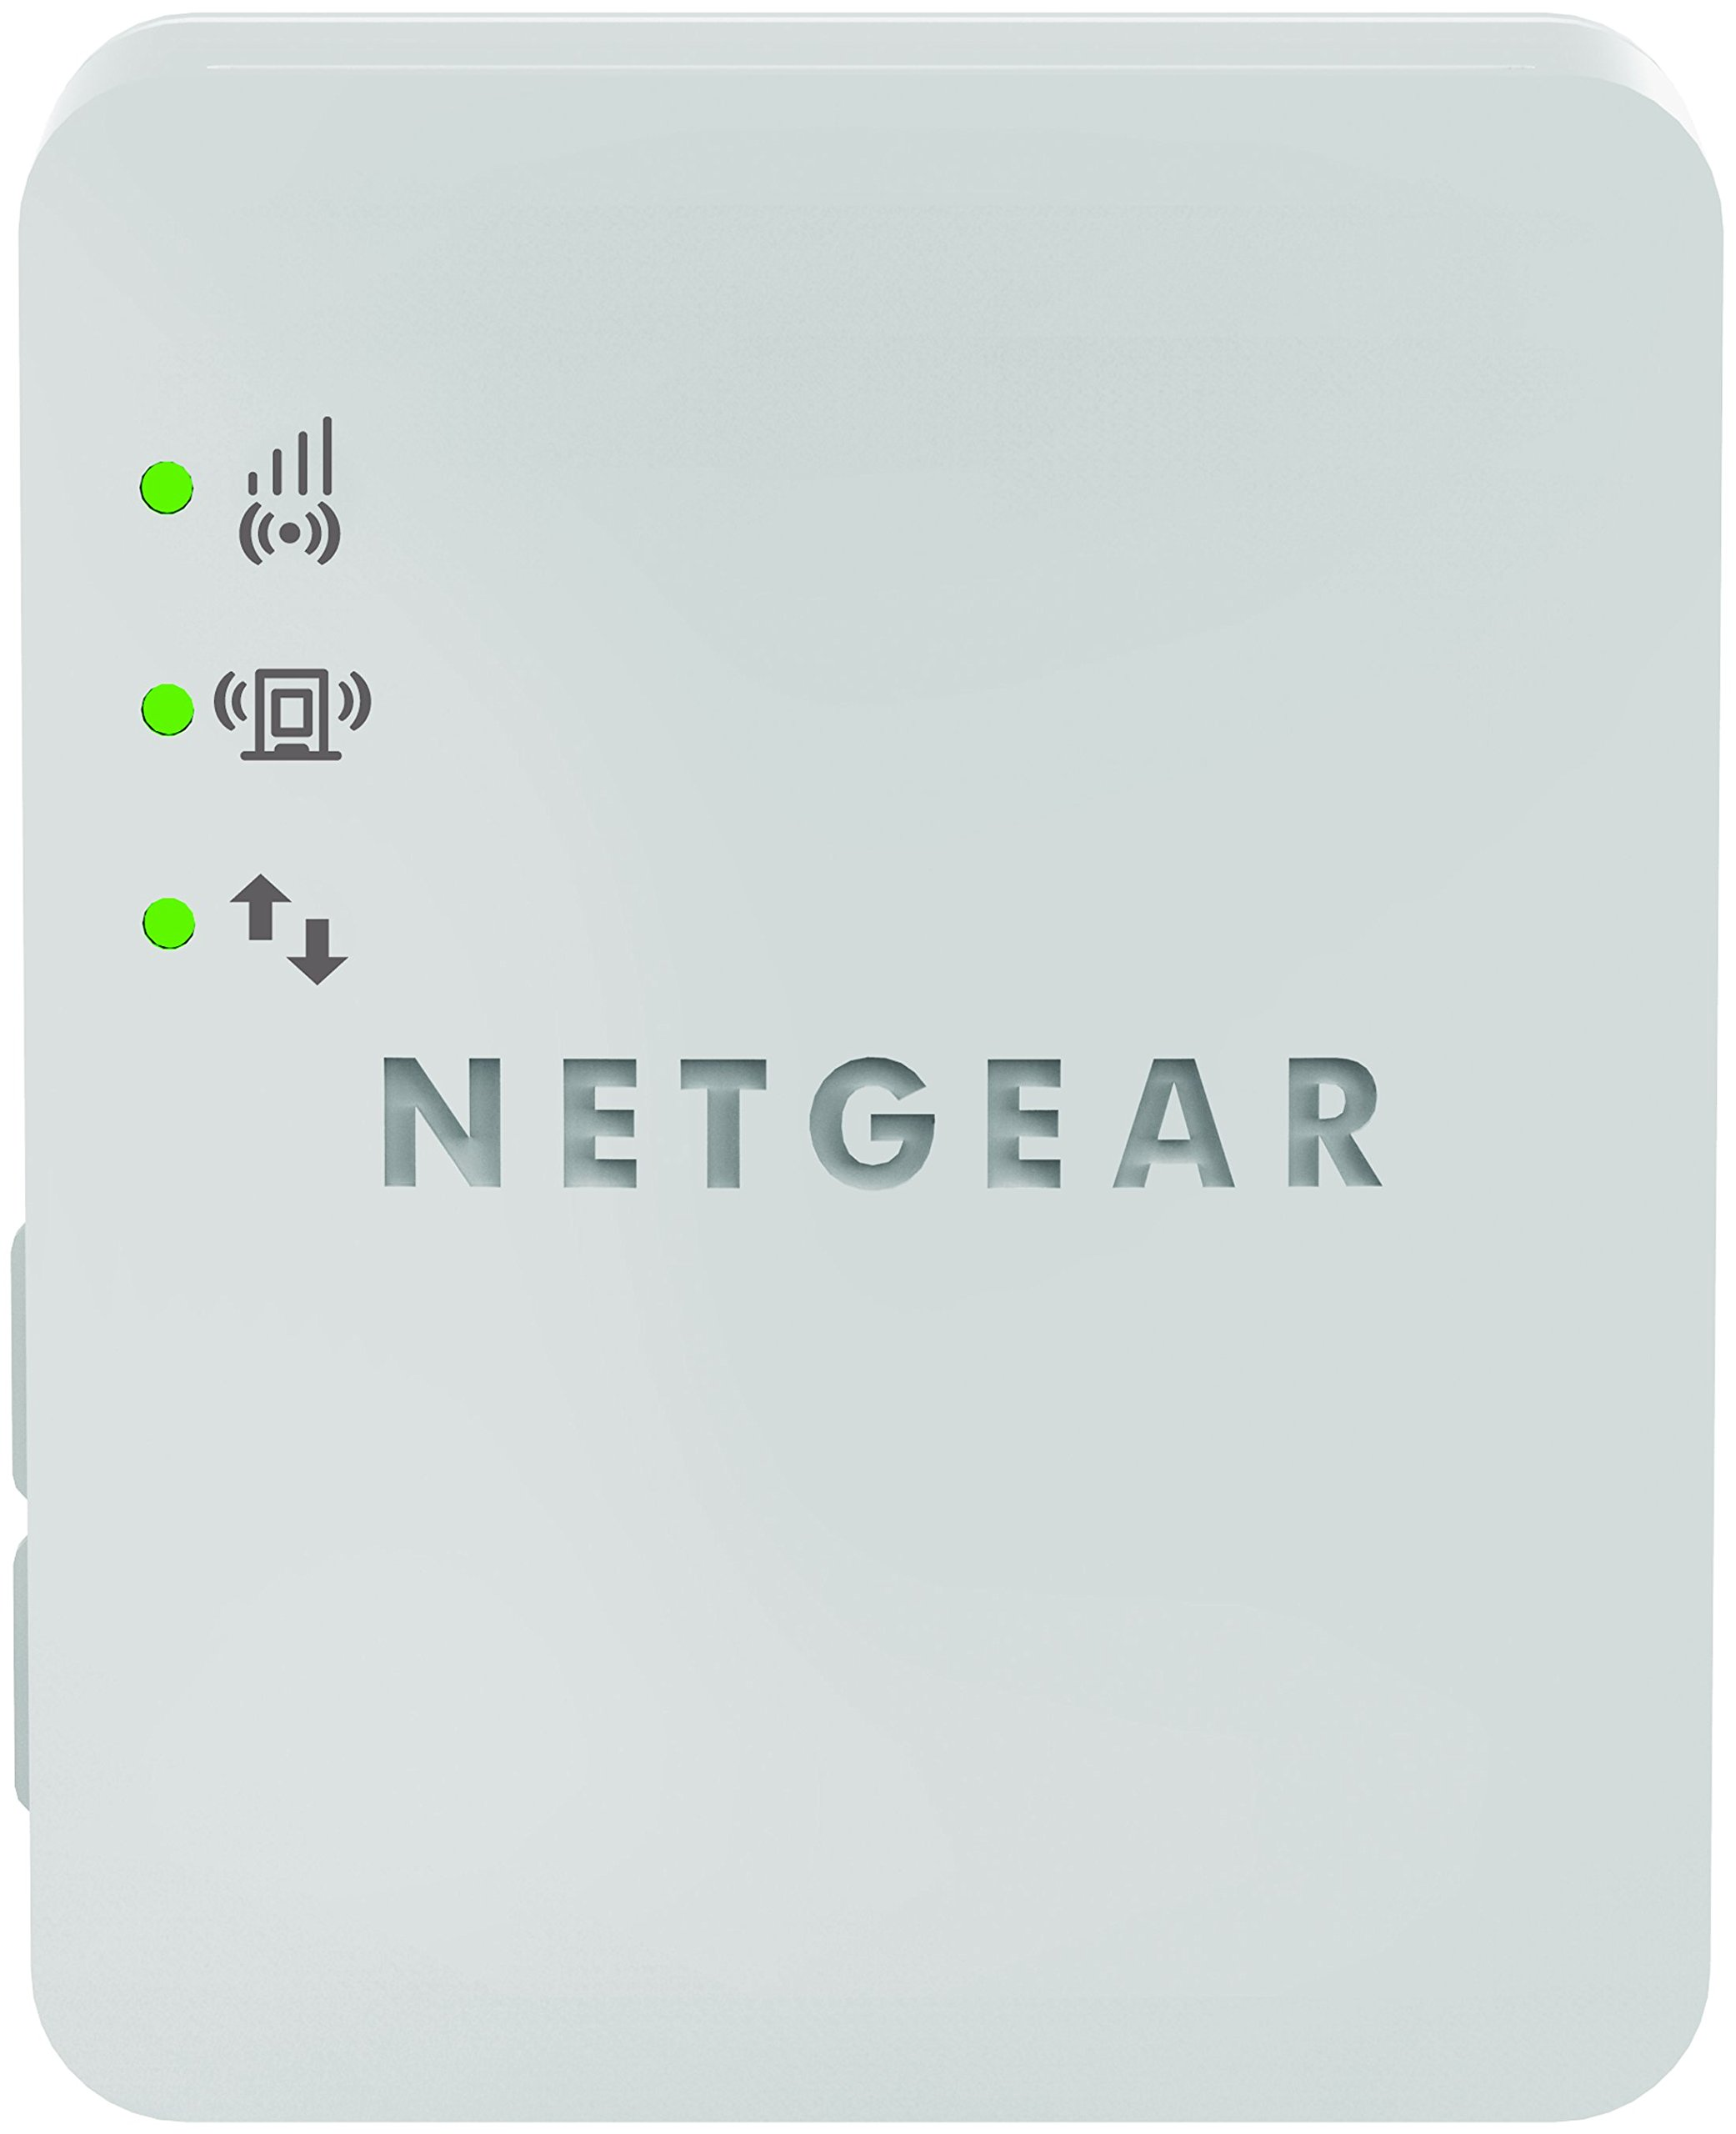 NETGEAR N150 Wi-Fi Range Extender for Mobile - Wall Plug Version (WN1000RP) by NETGEAR (Image #5)